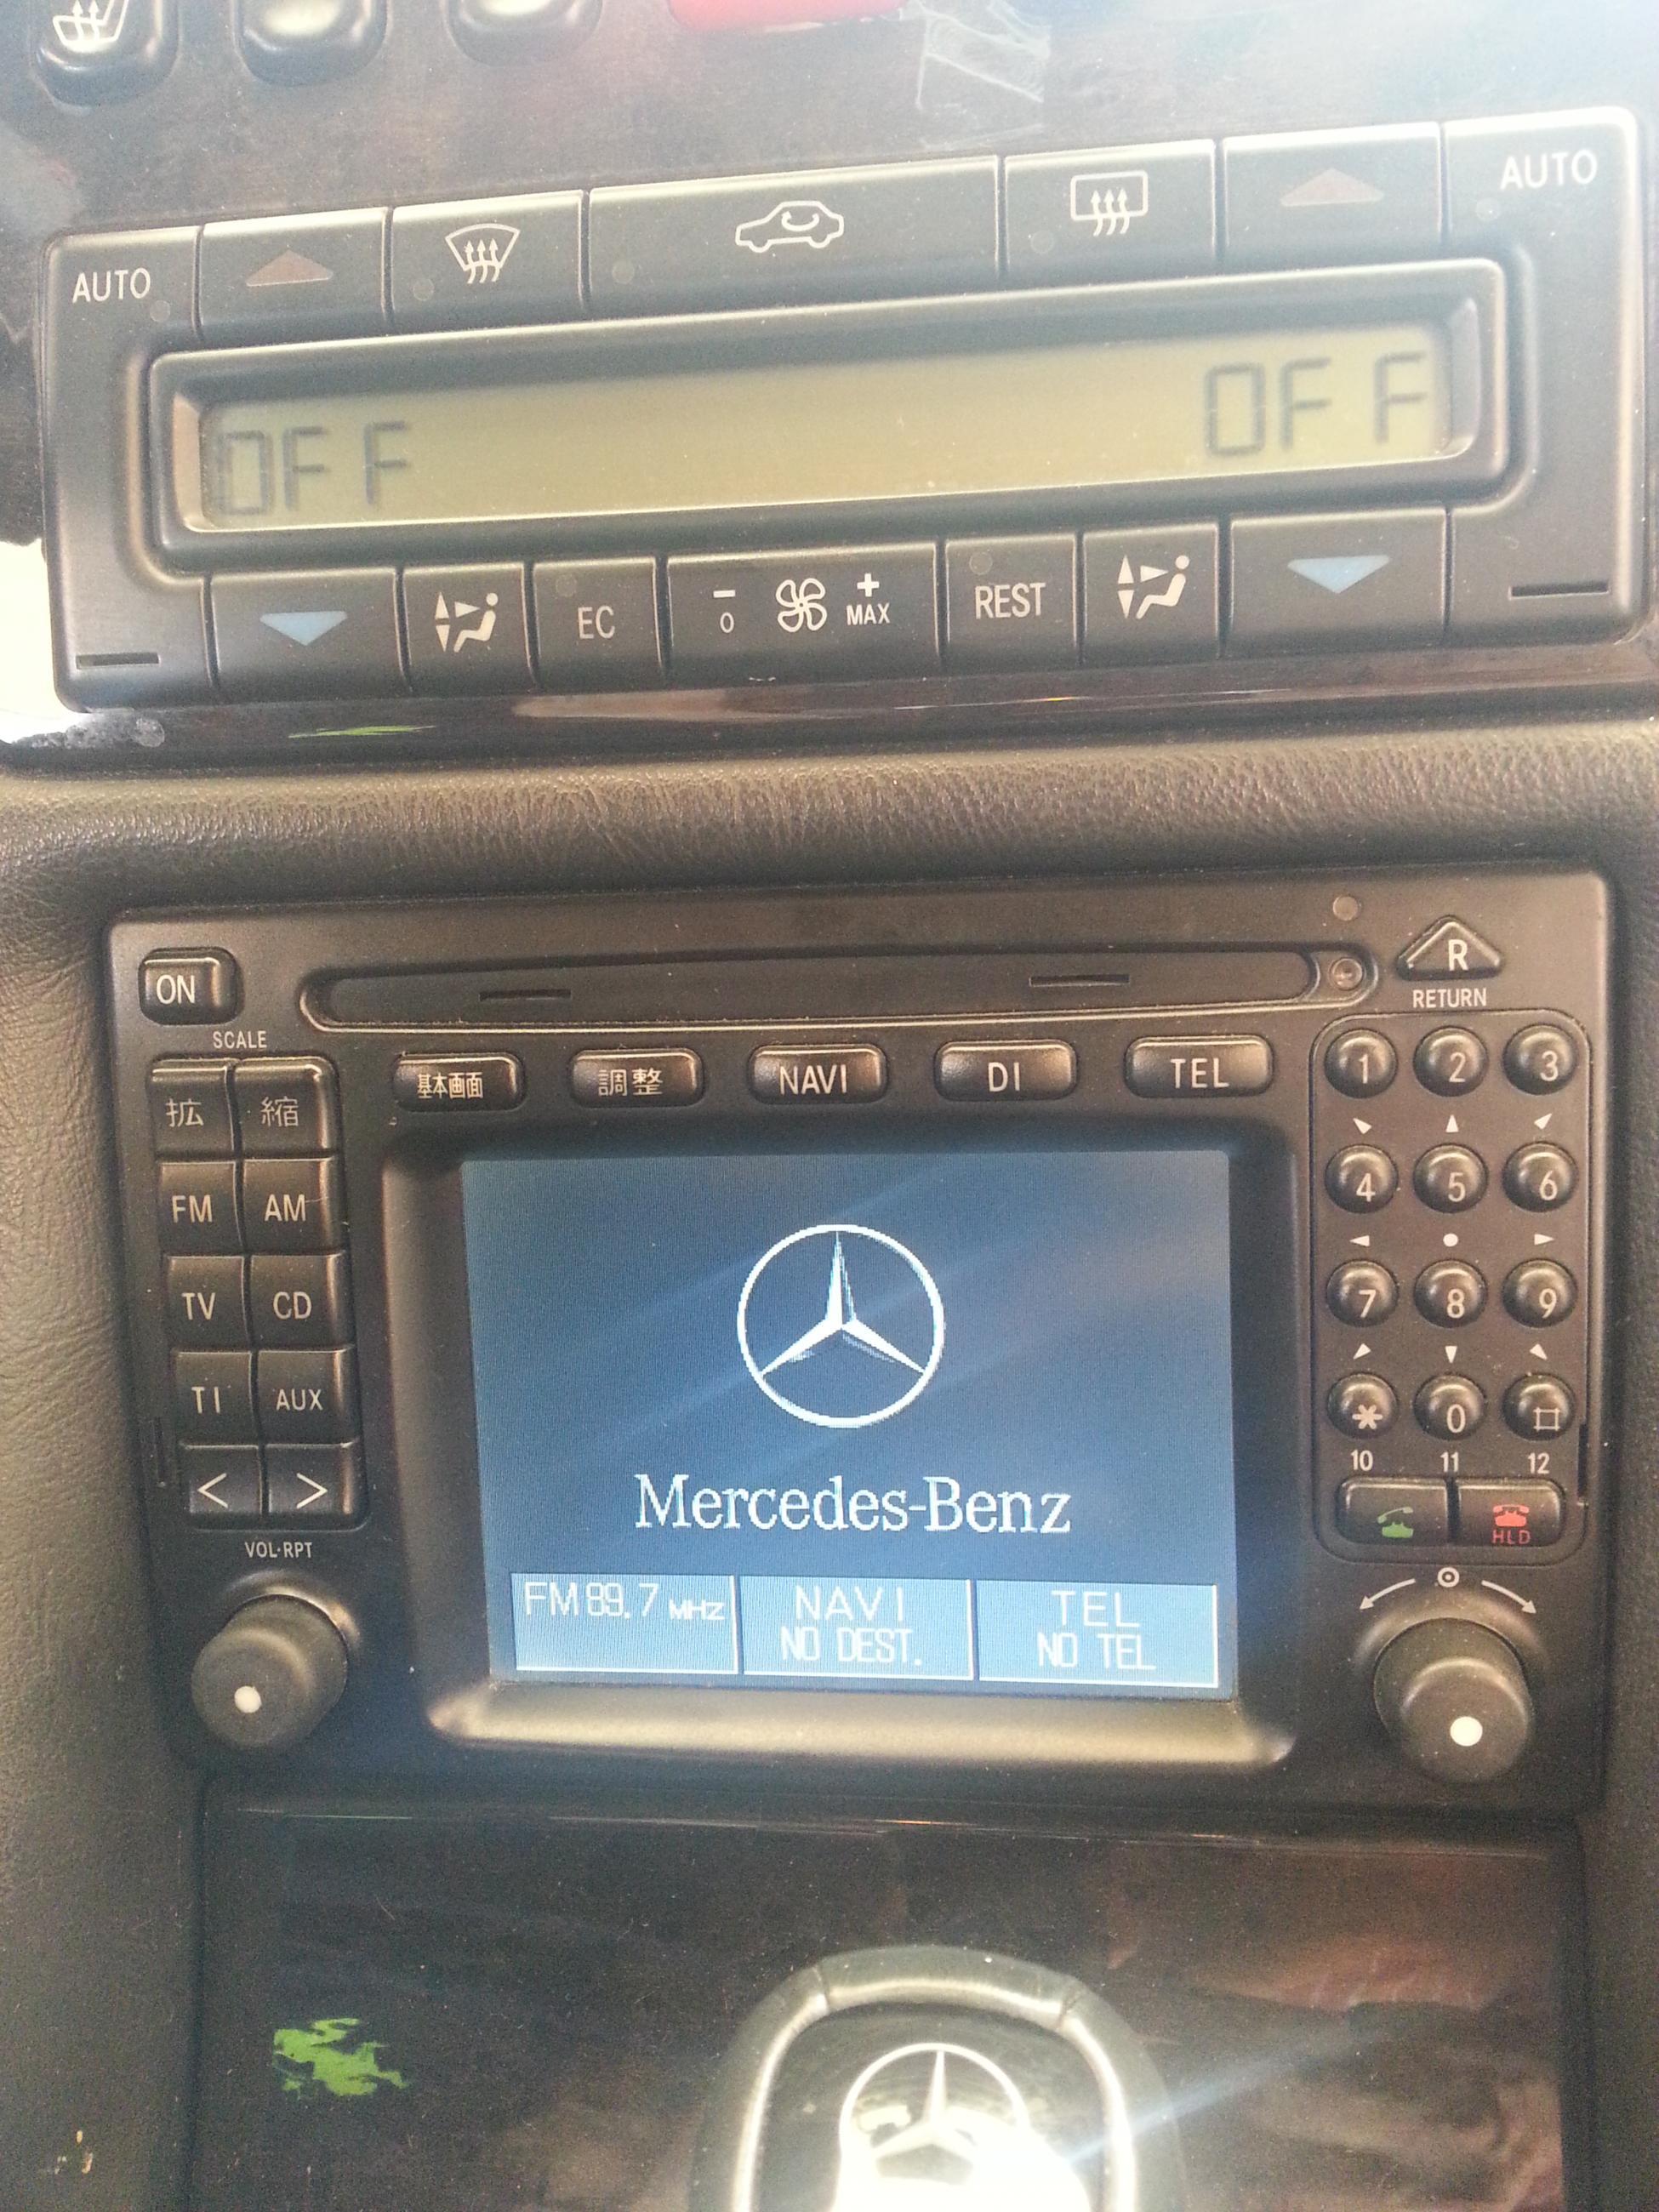 03 Clk 320 Navigation System